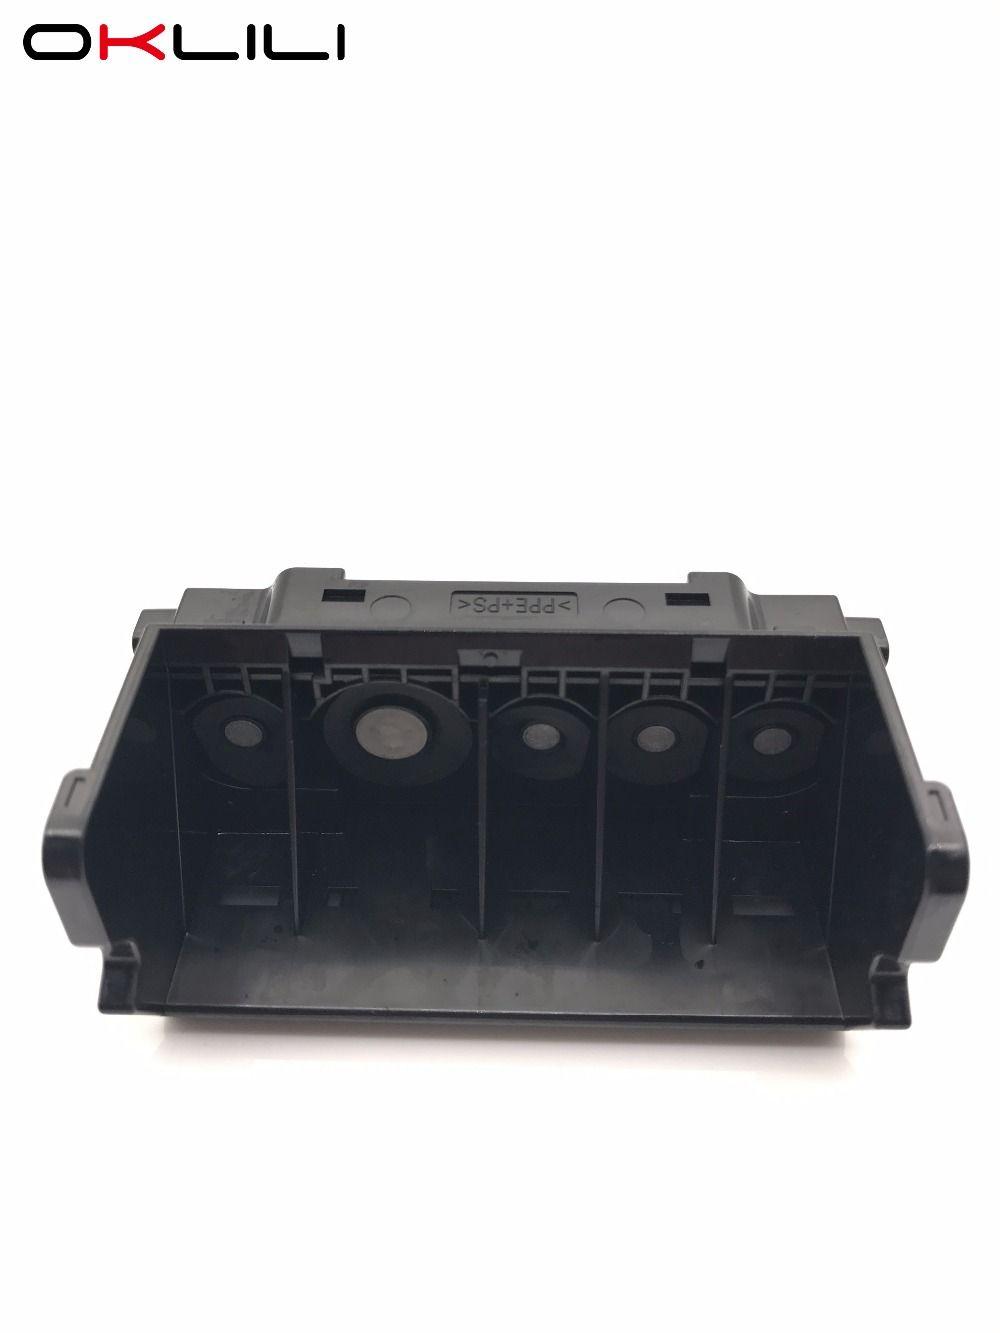 QY6-0073 Printhead Print Head for Canon MP620 MX860 MX868 MX870 MX878 MG5140